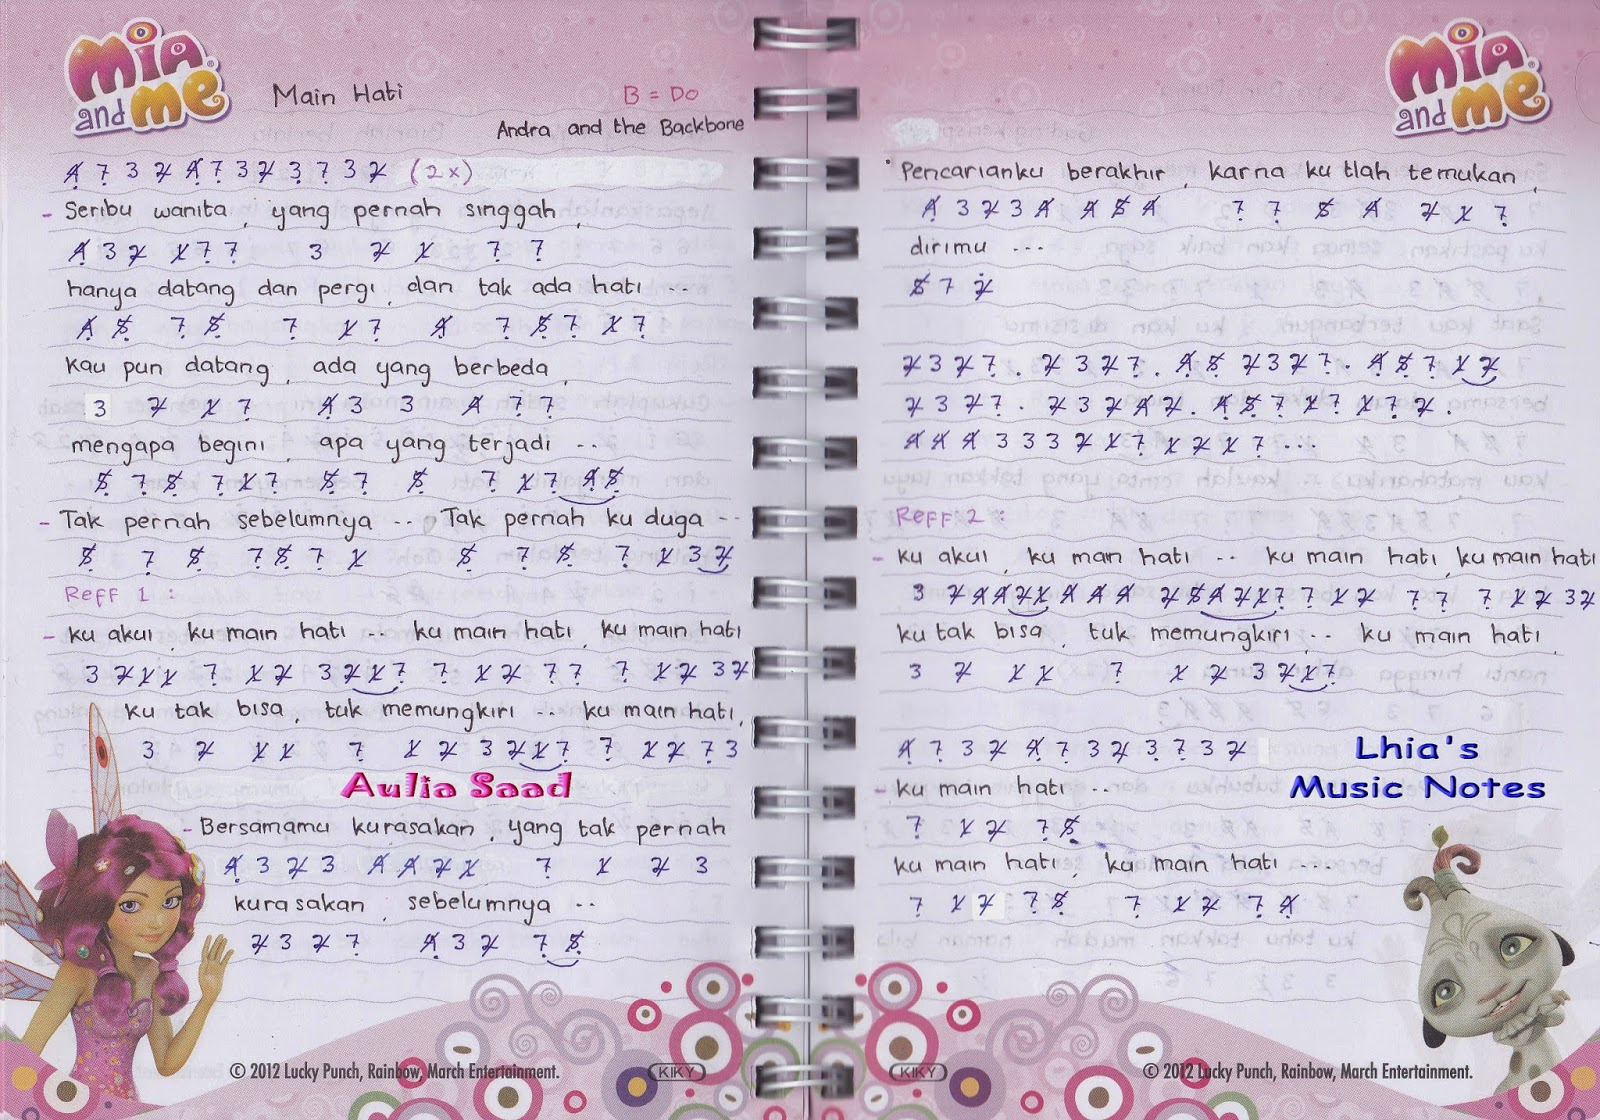 Andra and the backbone – sempurna mp3 | planetlagu download lagu.